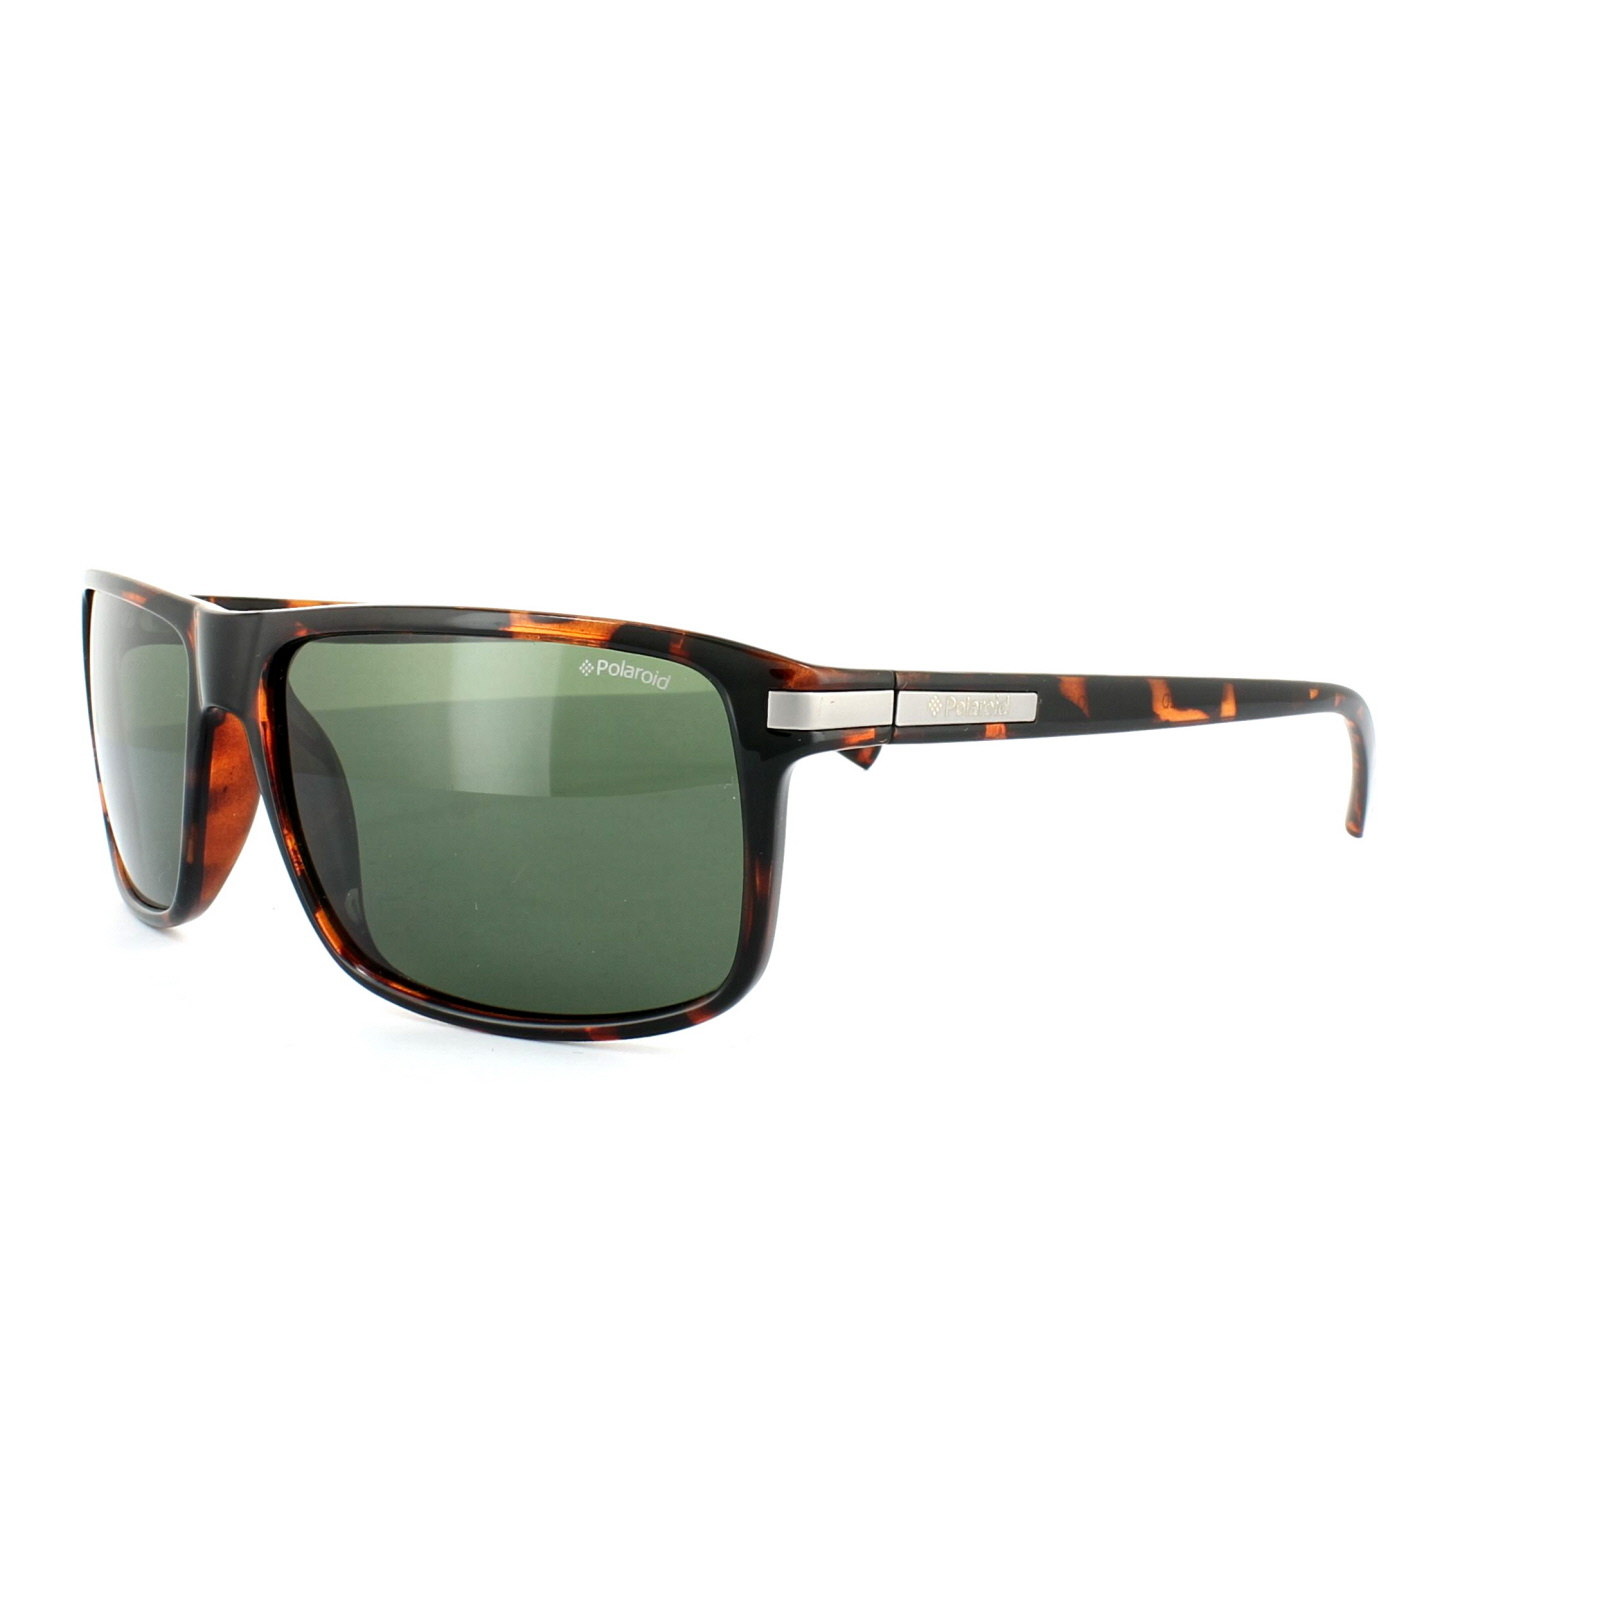 379d4249a6d Sentinel Polaroid Sunglasses 2019 S PZO H8 Havana Green Polarized